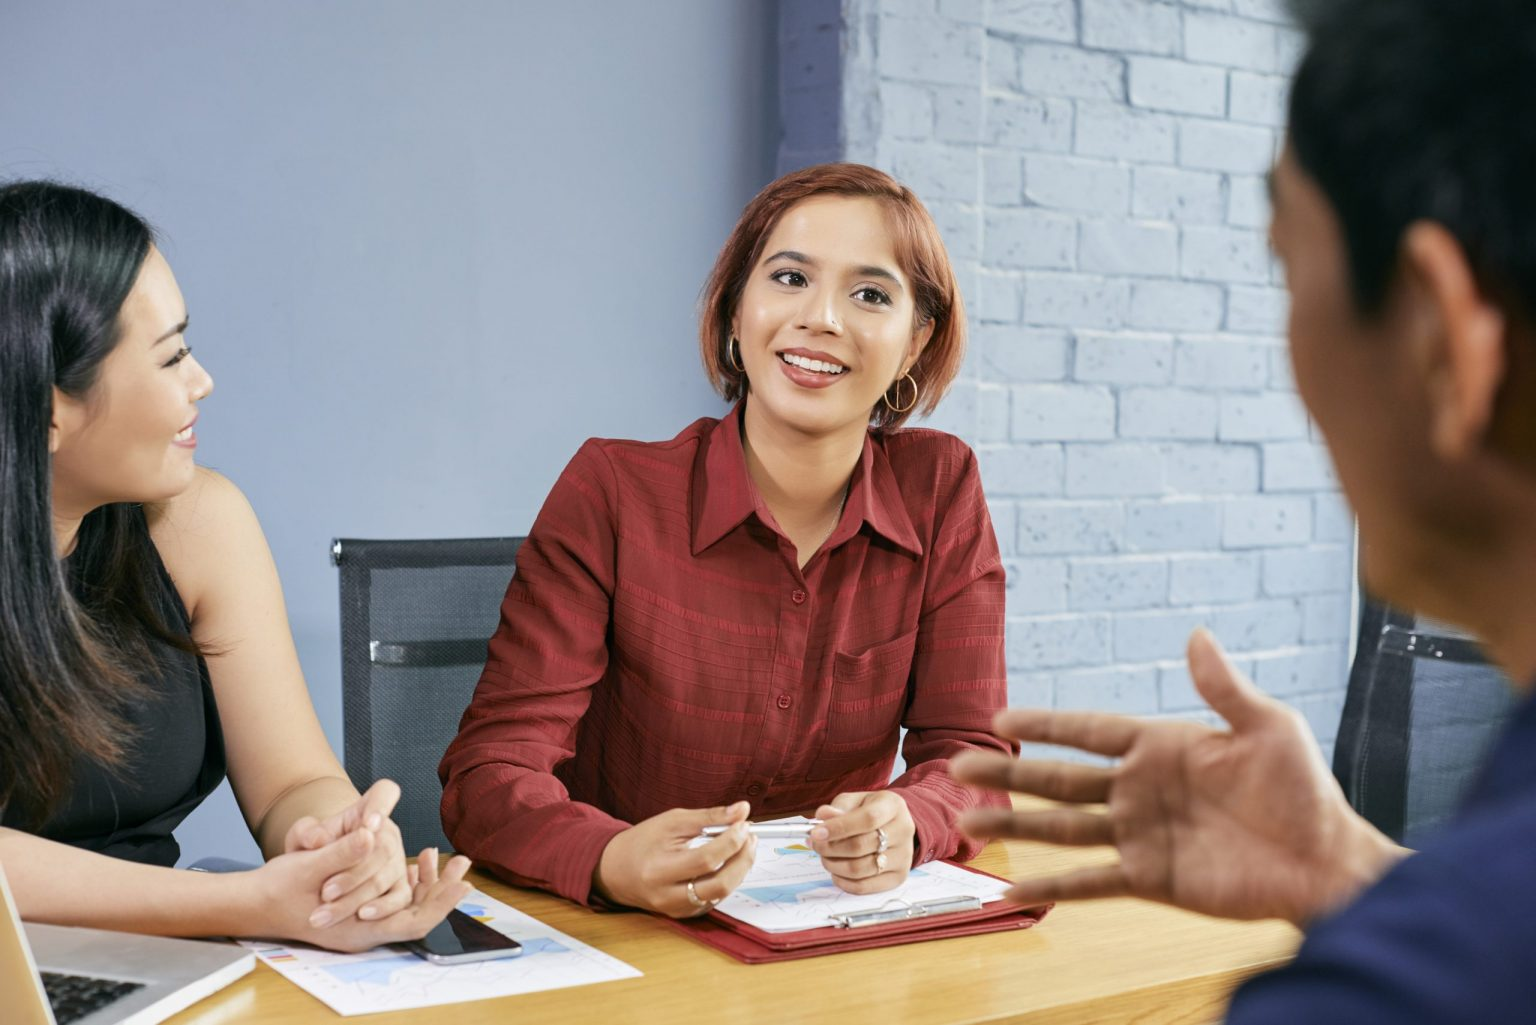 Kĩ năng giao tiếp kinh doanh lịch sự